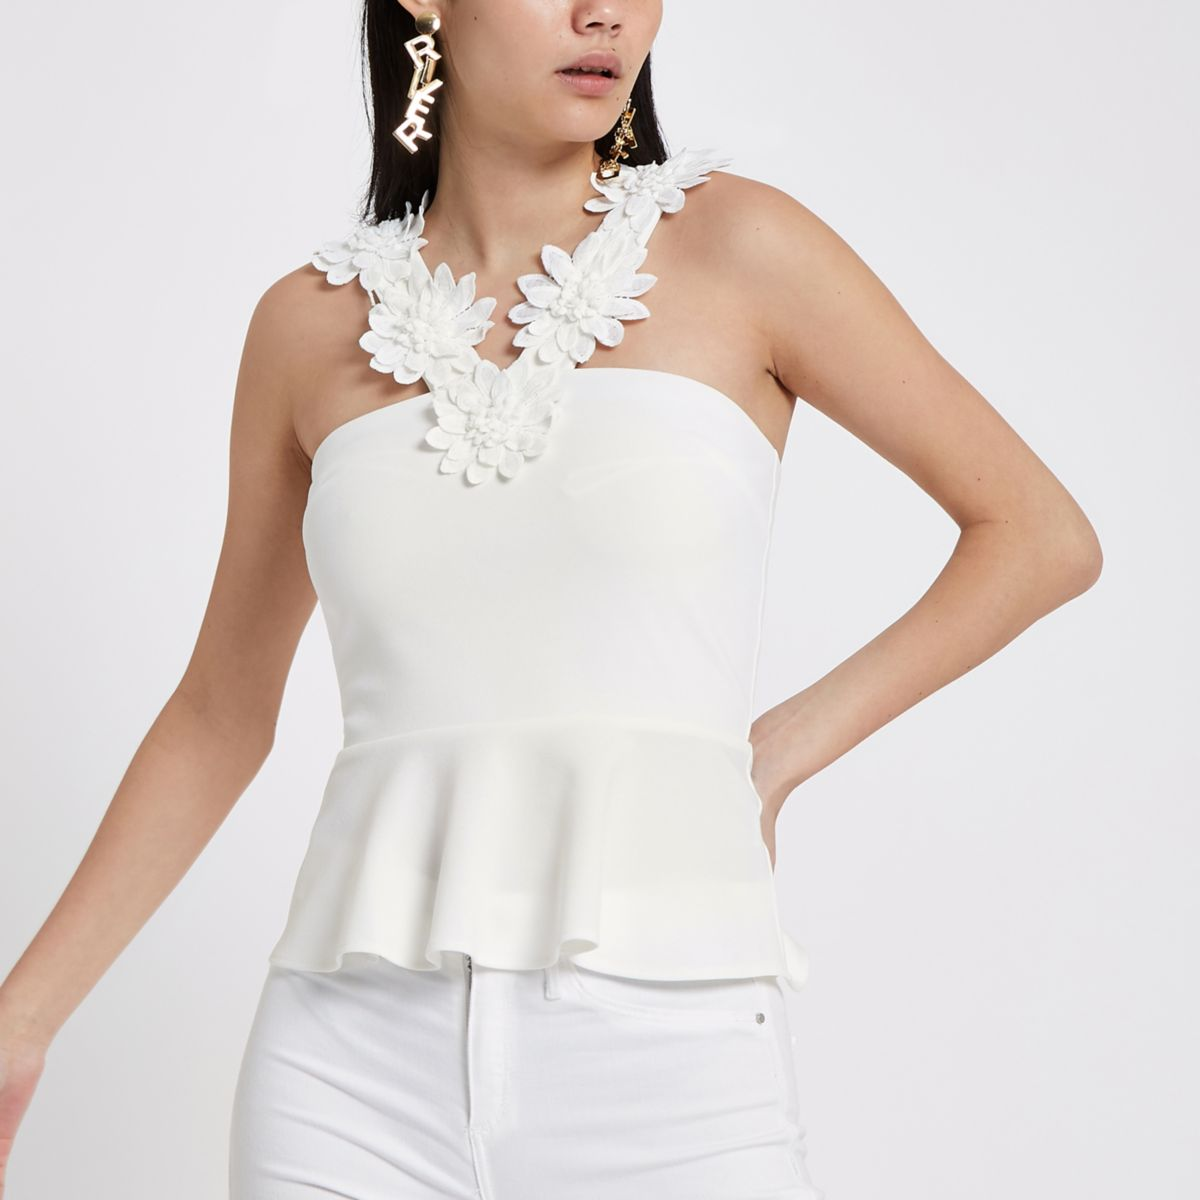 White floral trim cami top